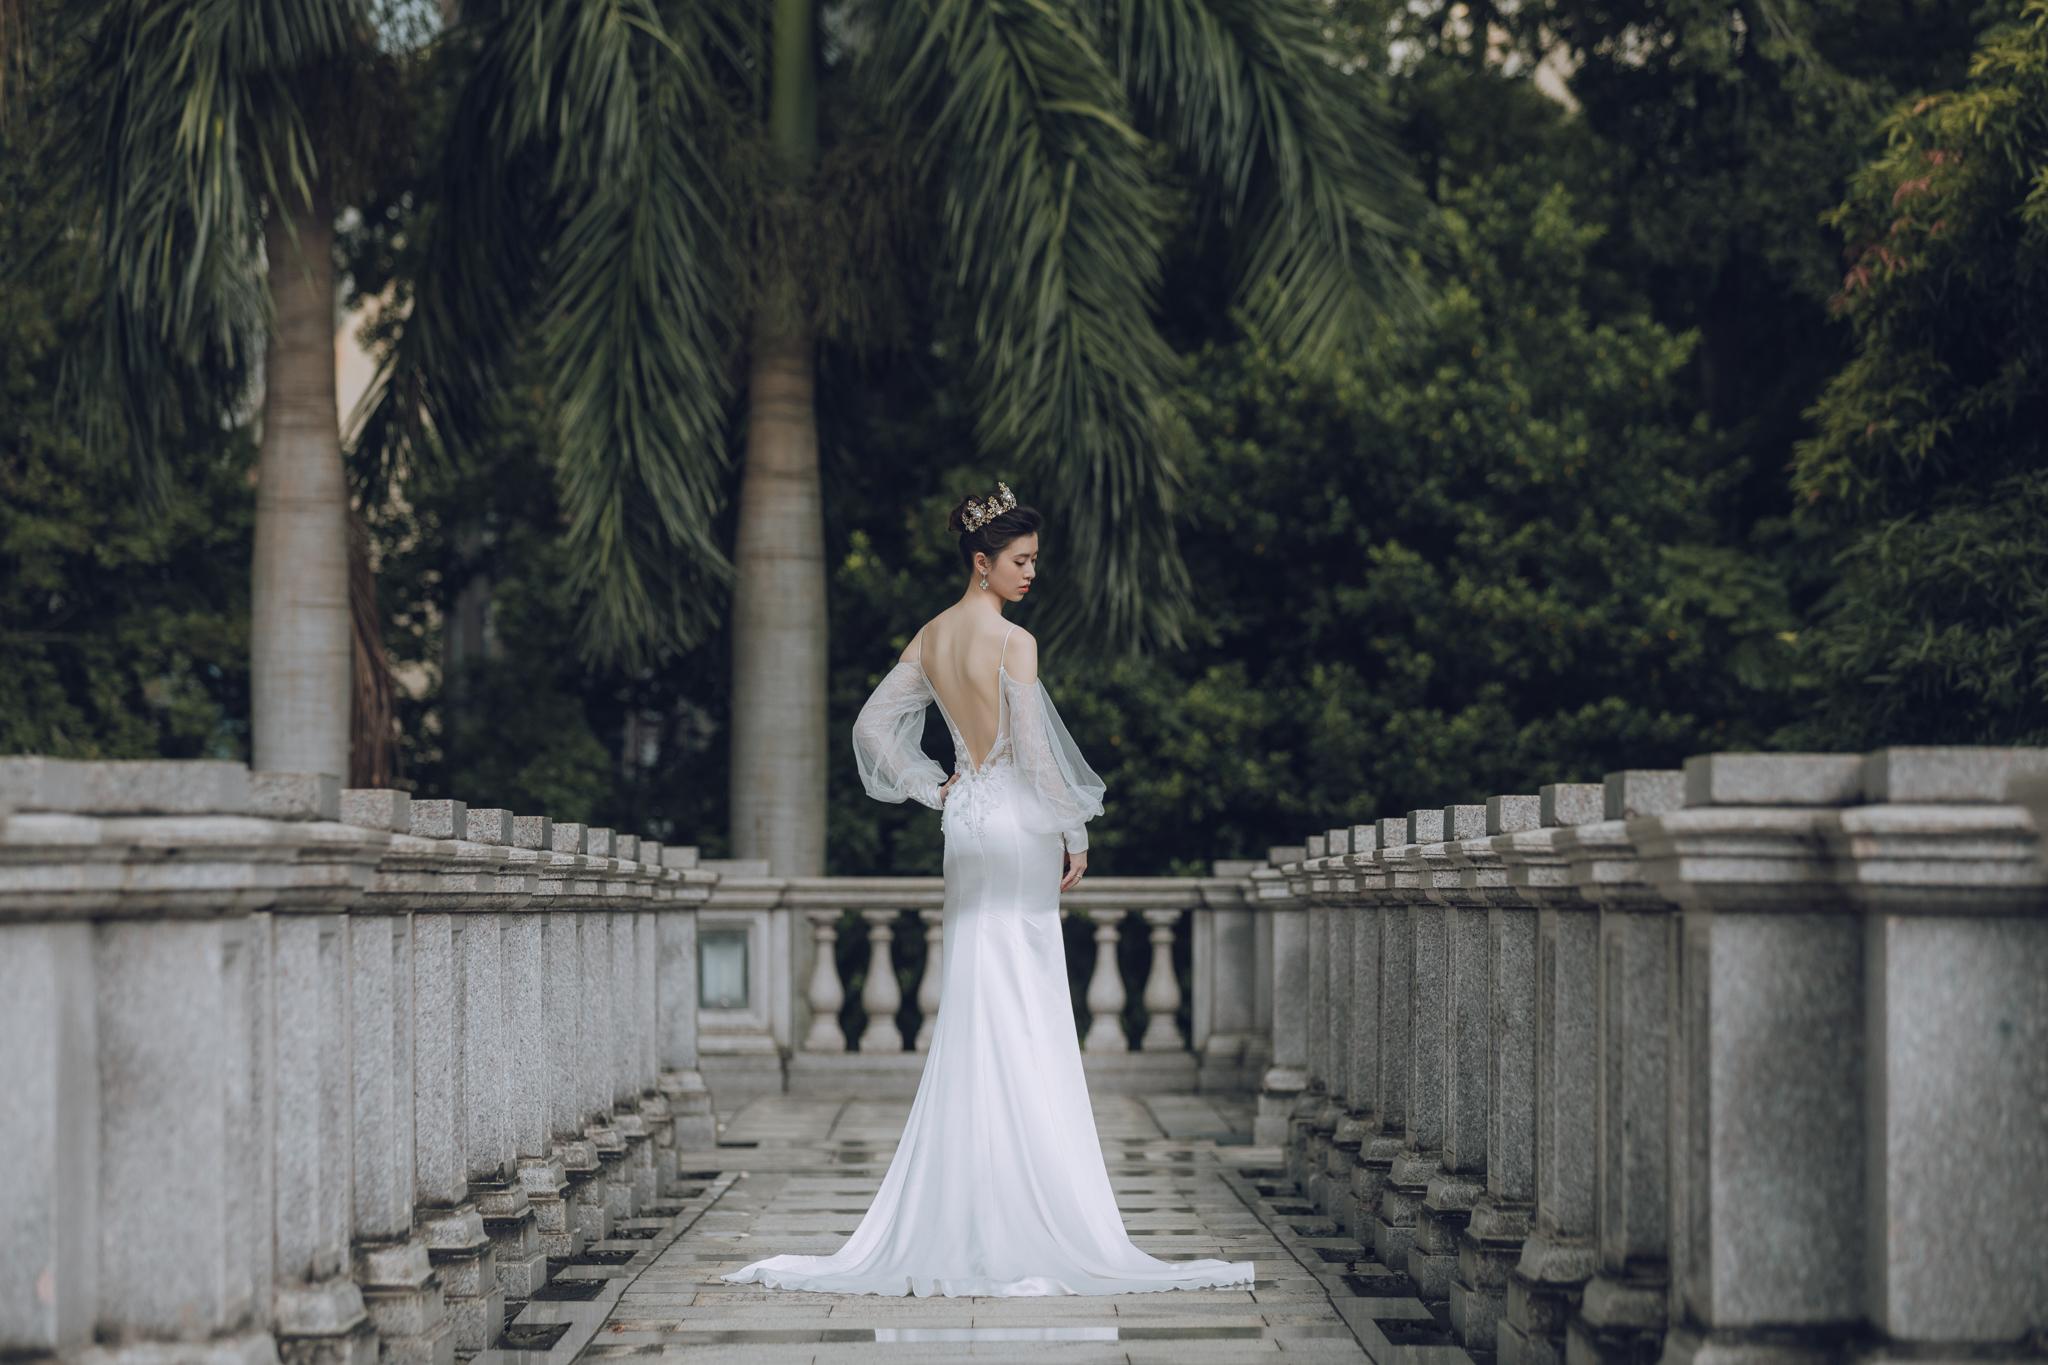 《自助婚紗》Phil & Vicky | 攝影師 Eric Yeh | 良大攝影工作室